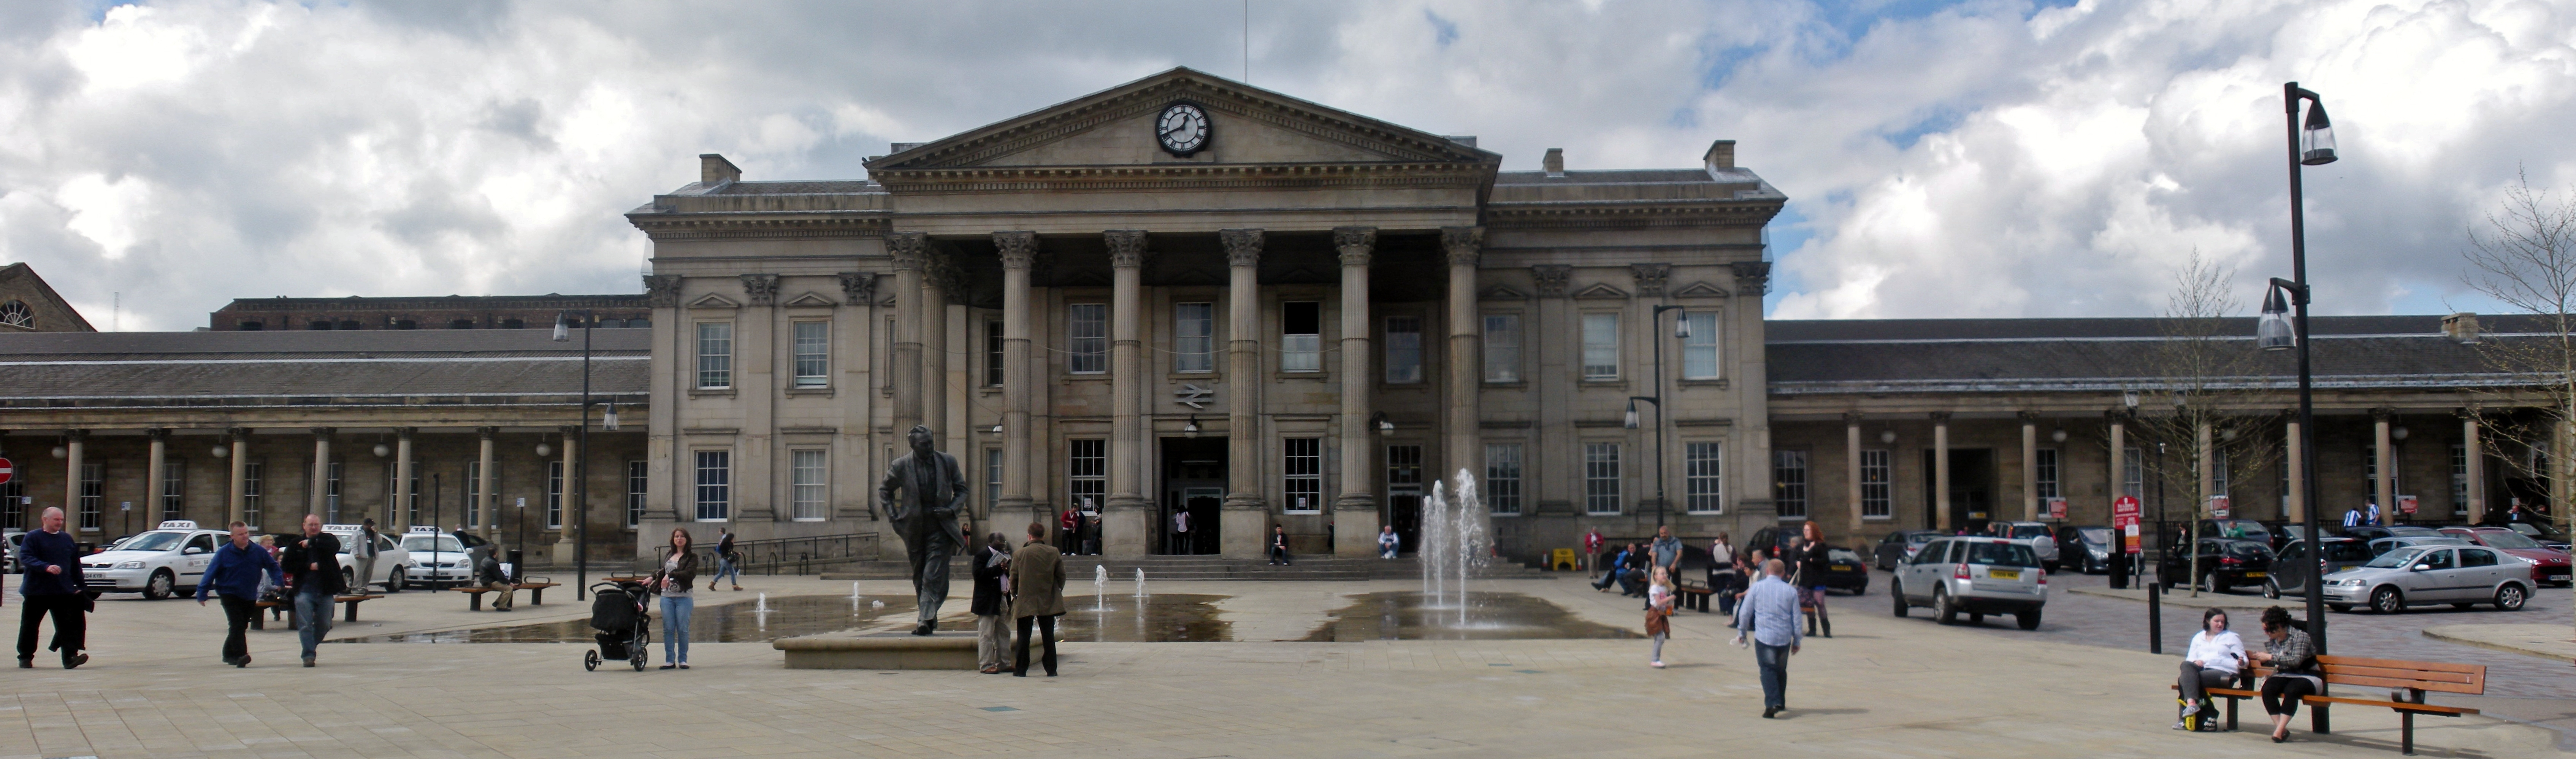 Huddersfield Familypedia Fandom Powered By Wikia